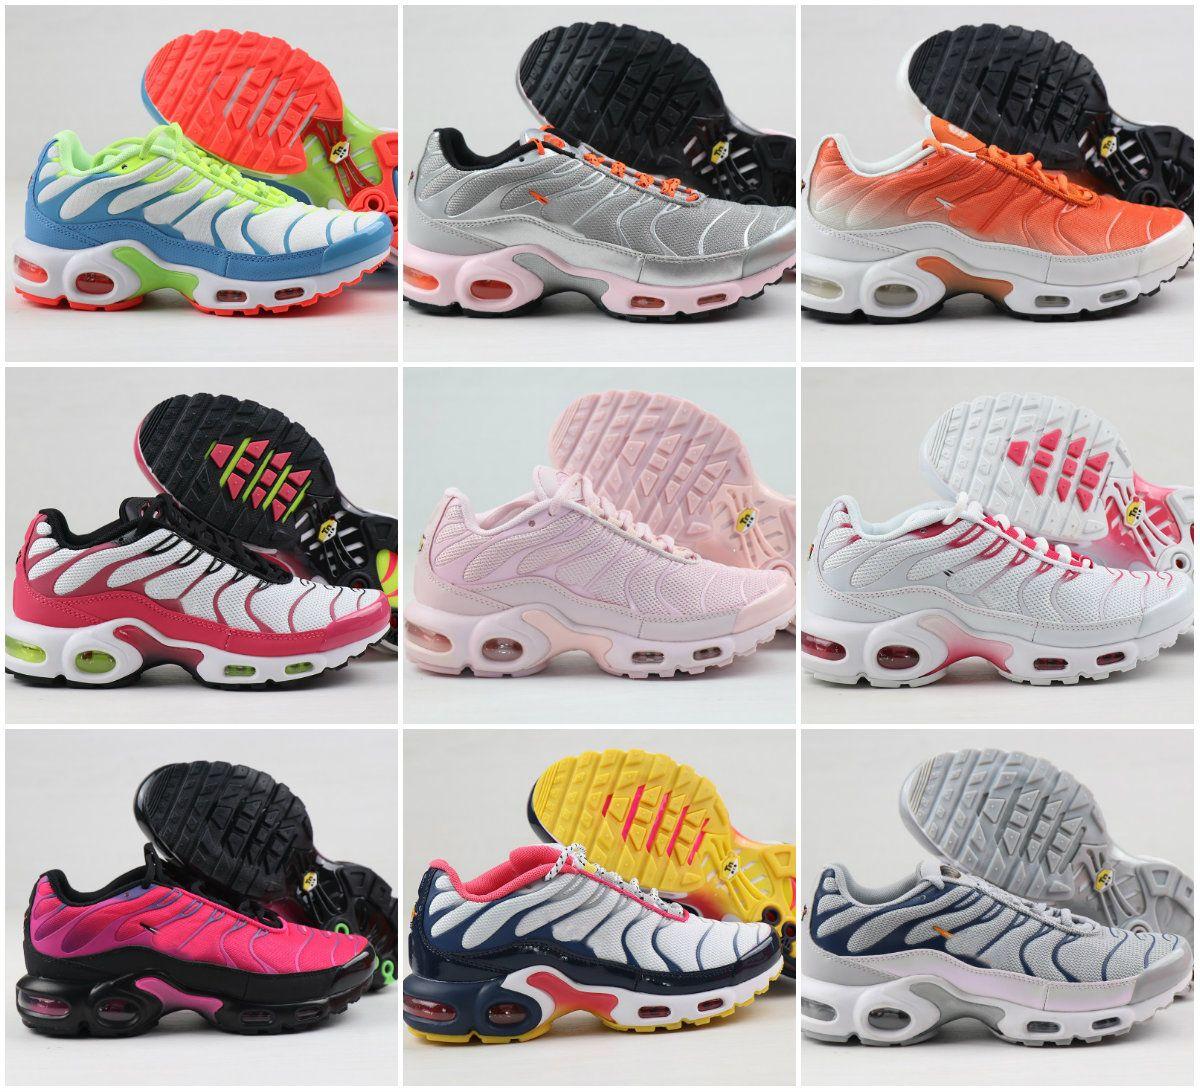 2020 NEW Original AIR Tn Plus WOmen SHOEs DesigNs CHEap Tn REquin Chaussures Femme Ultra OG Sneakers Triple Black White Sports Trainers Shoe